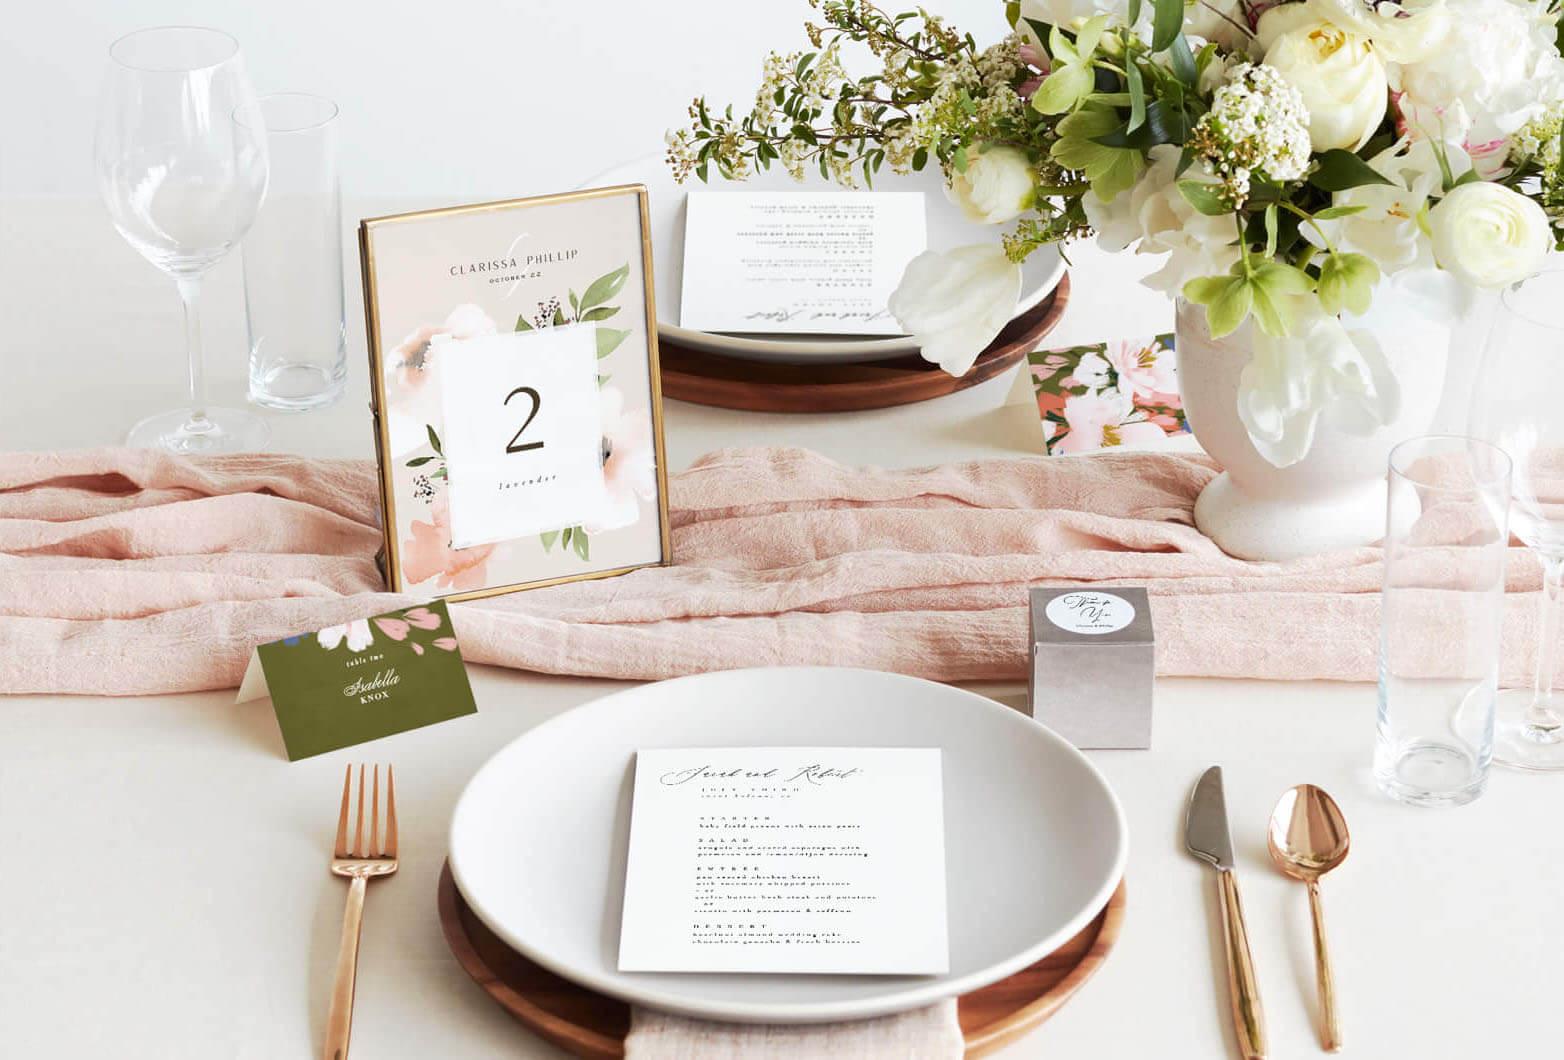 Ceremony and Reception essentials